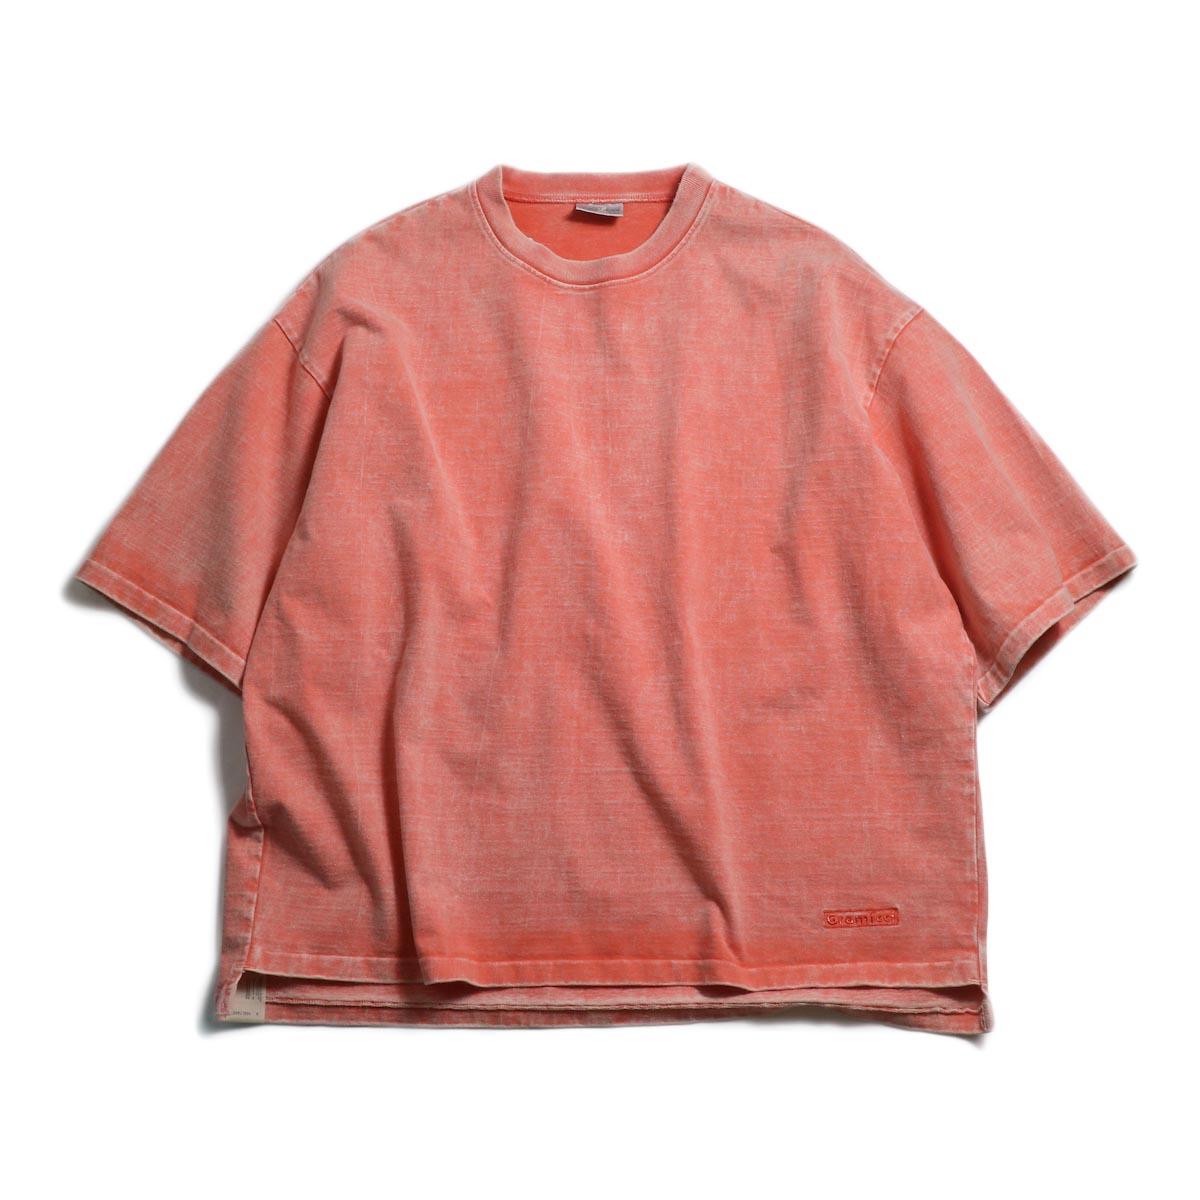 N.HOOLYWOOD × Gramicci  / 191-CS27-024 Short Sleeve Tee -Pink 正面